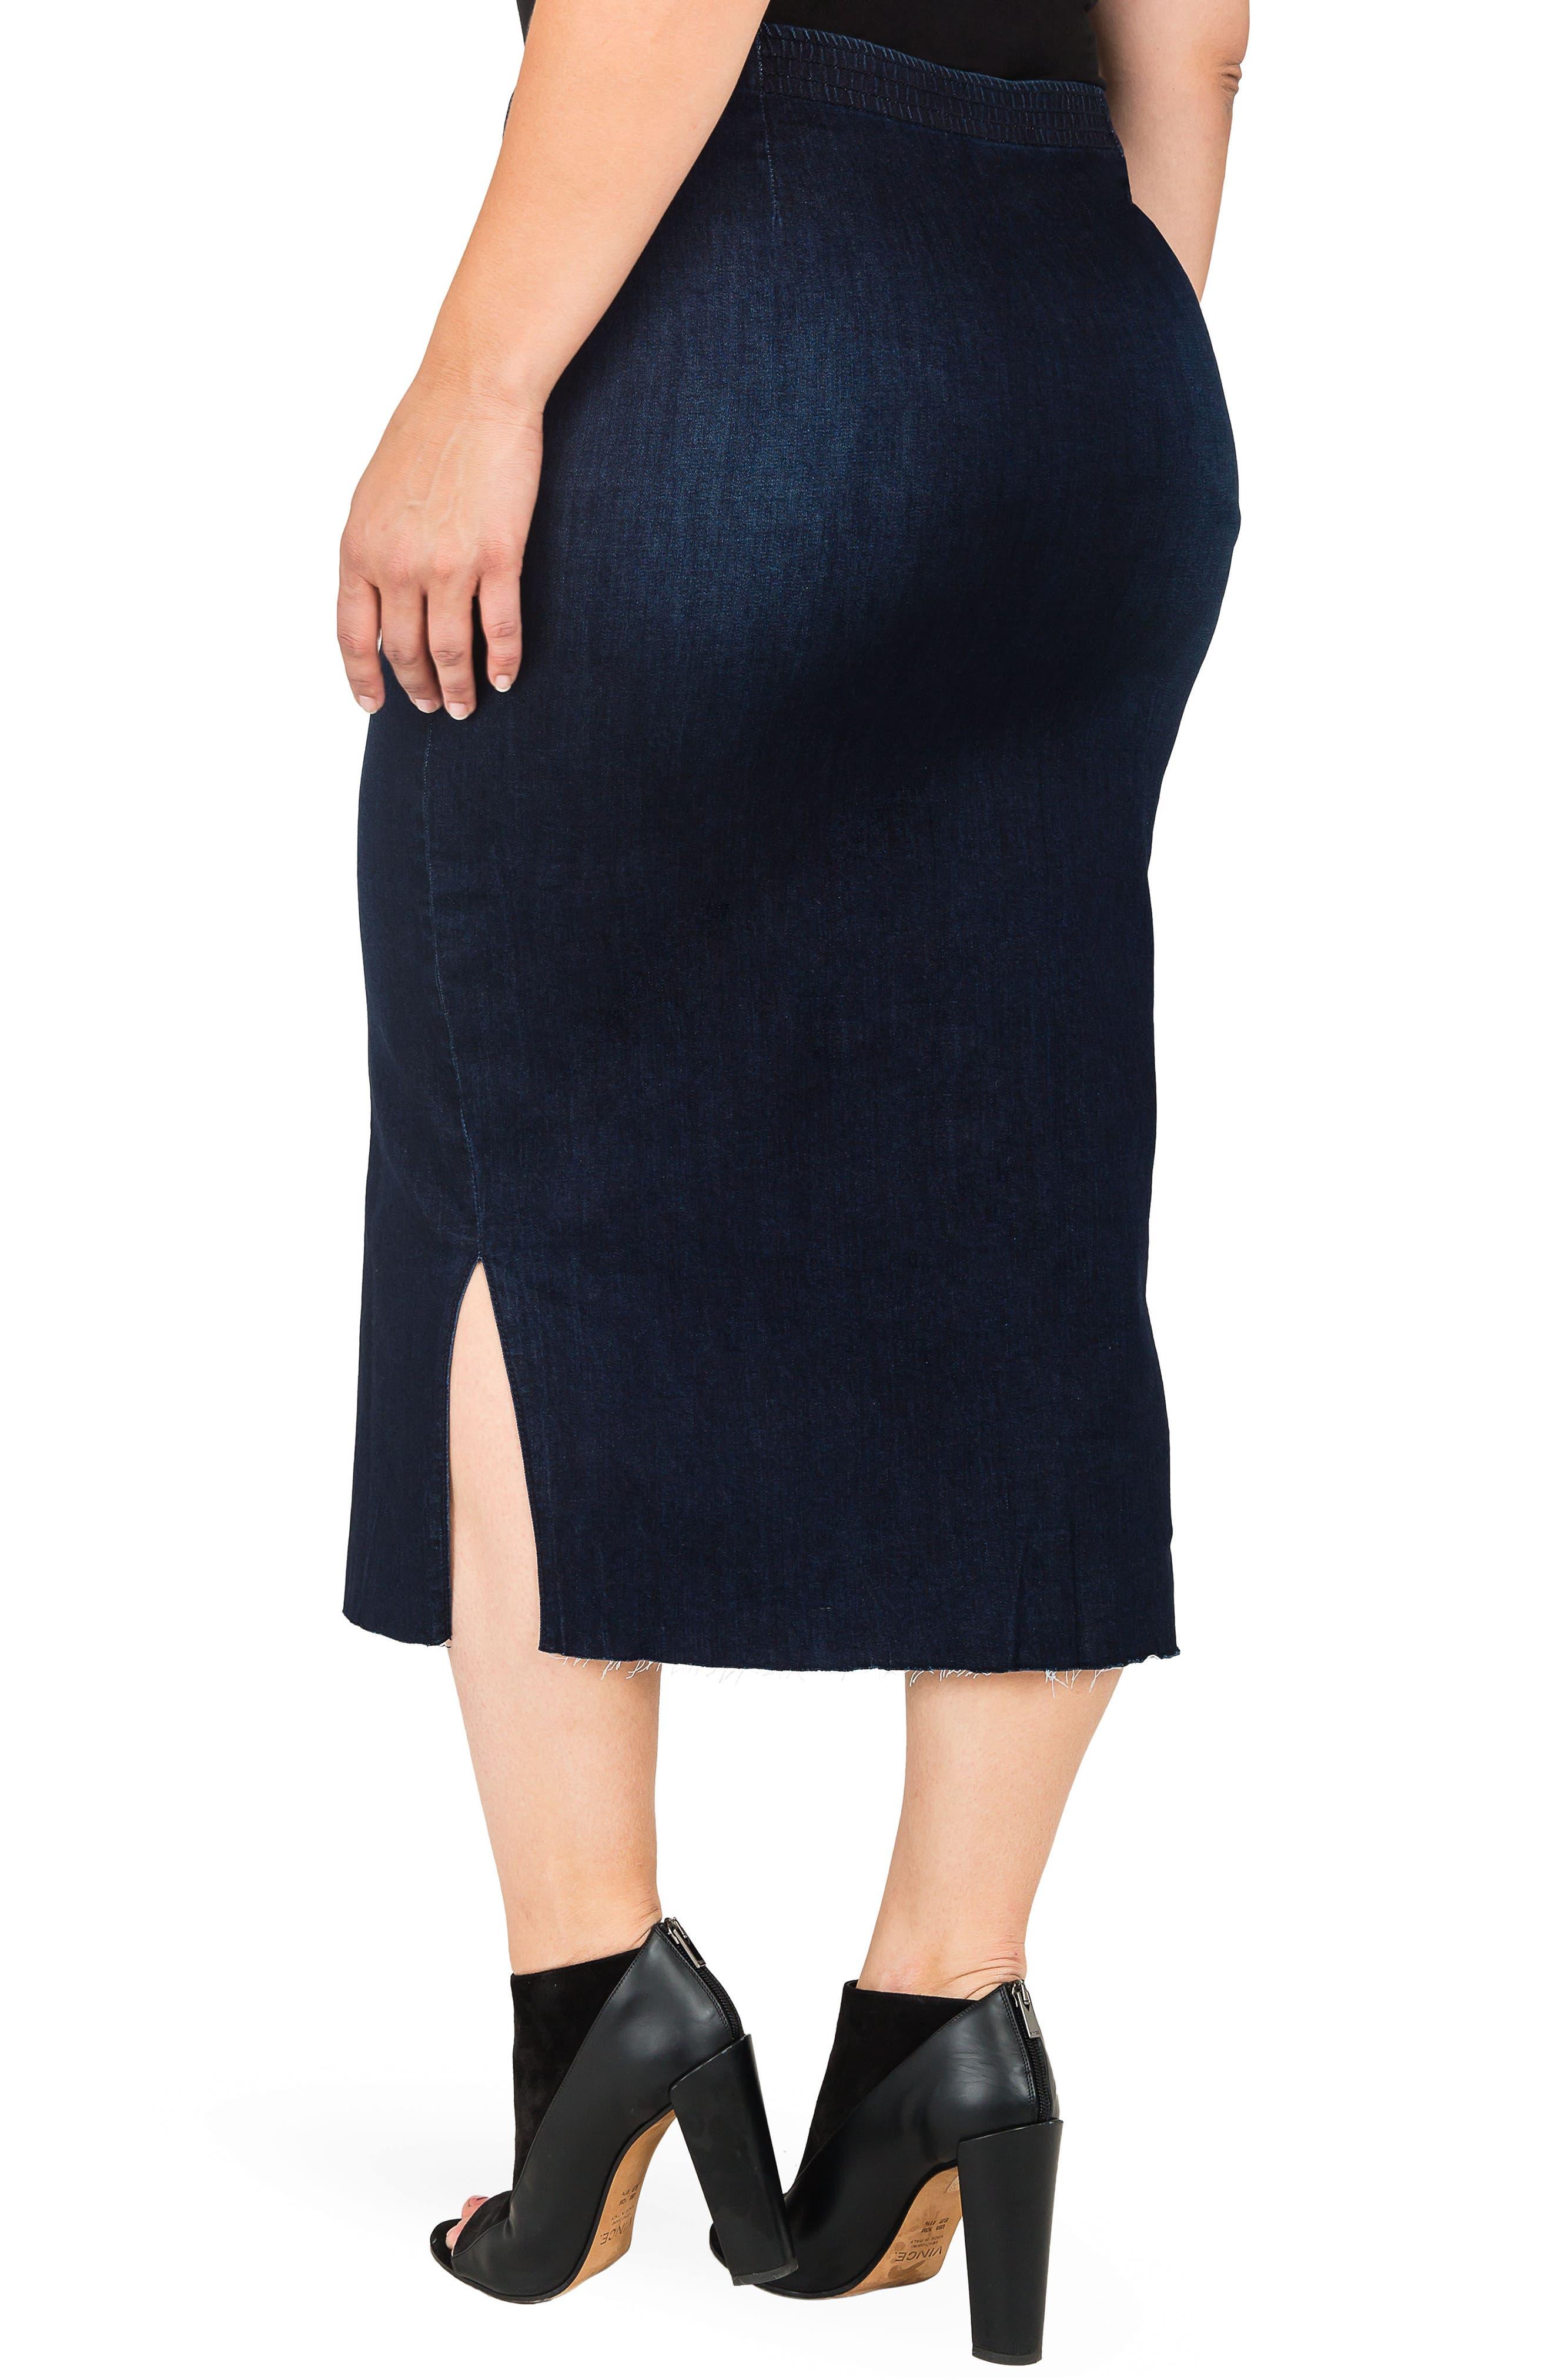 Elain Denim Pencil Skirt,                             Alternate thumbnail 2, color,                             BLUE